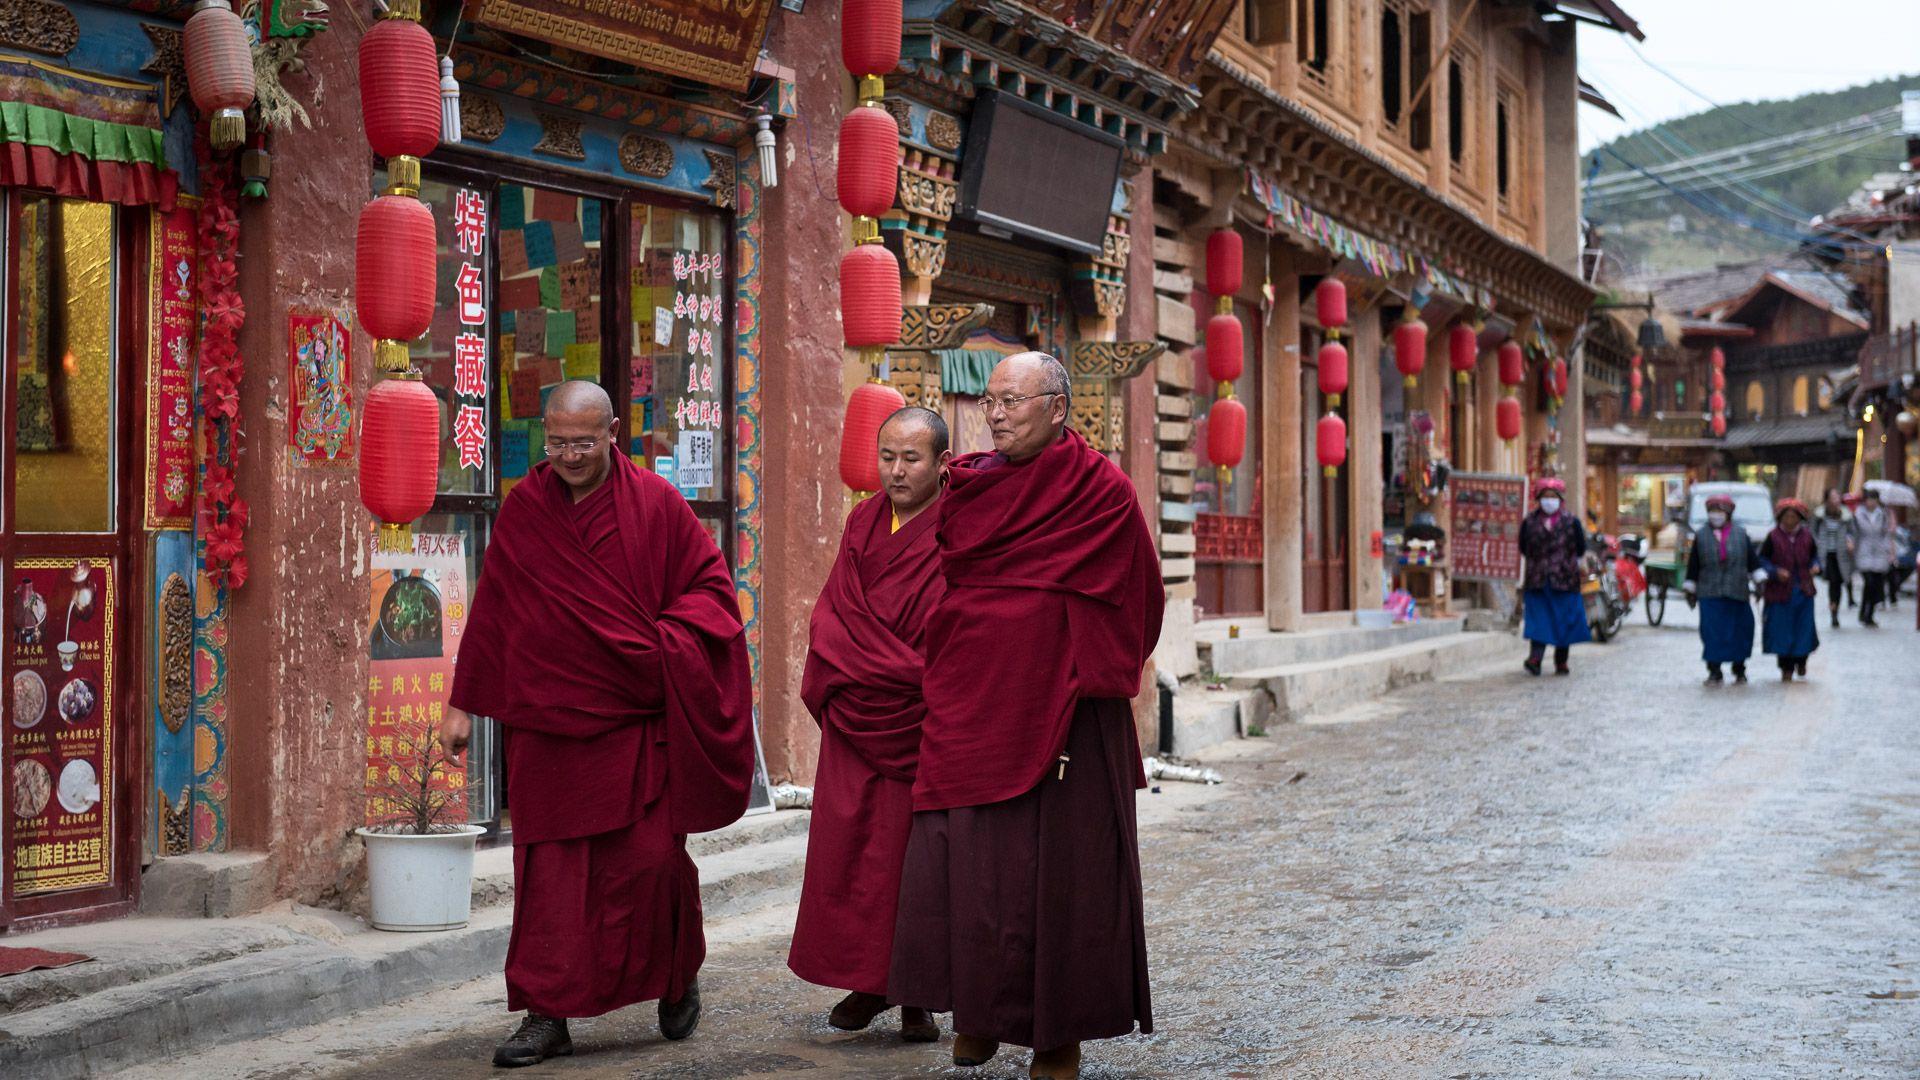 Tibet wallpaper photo full hd